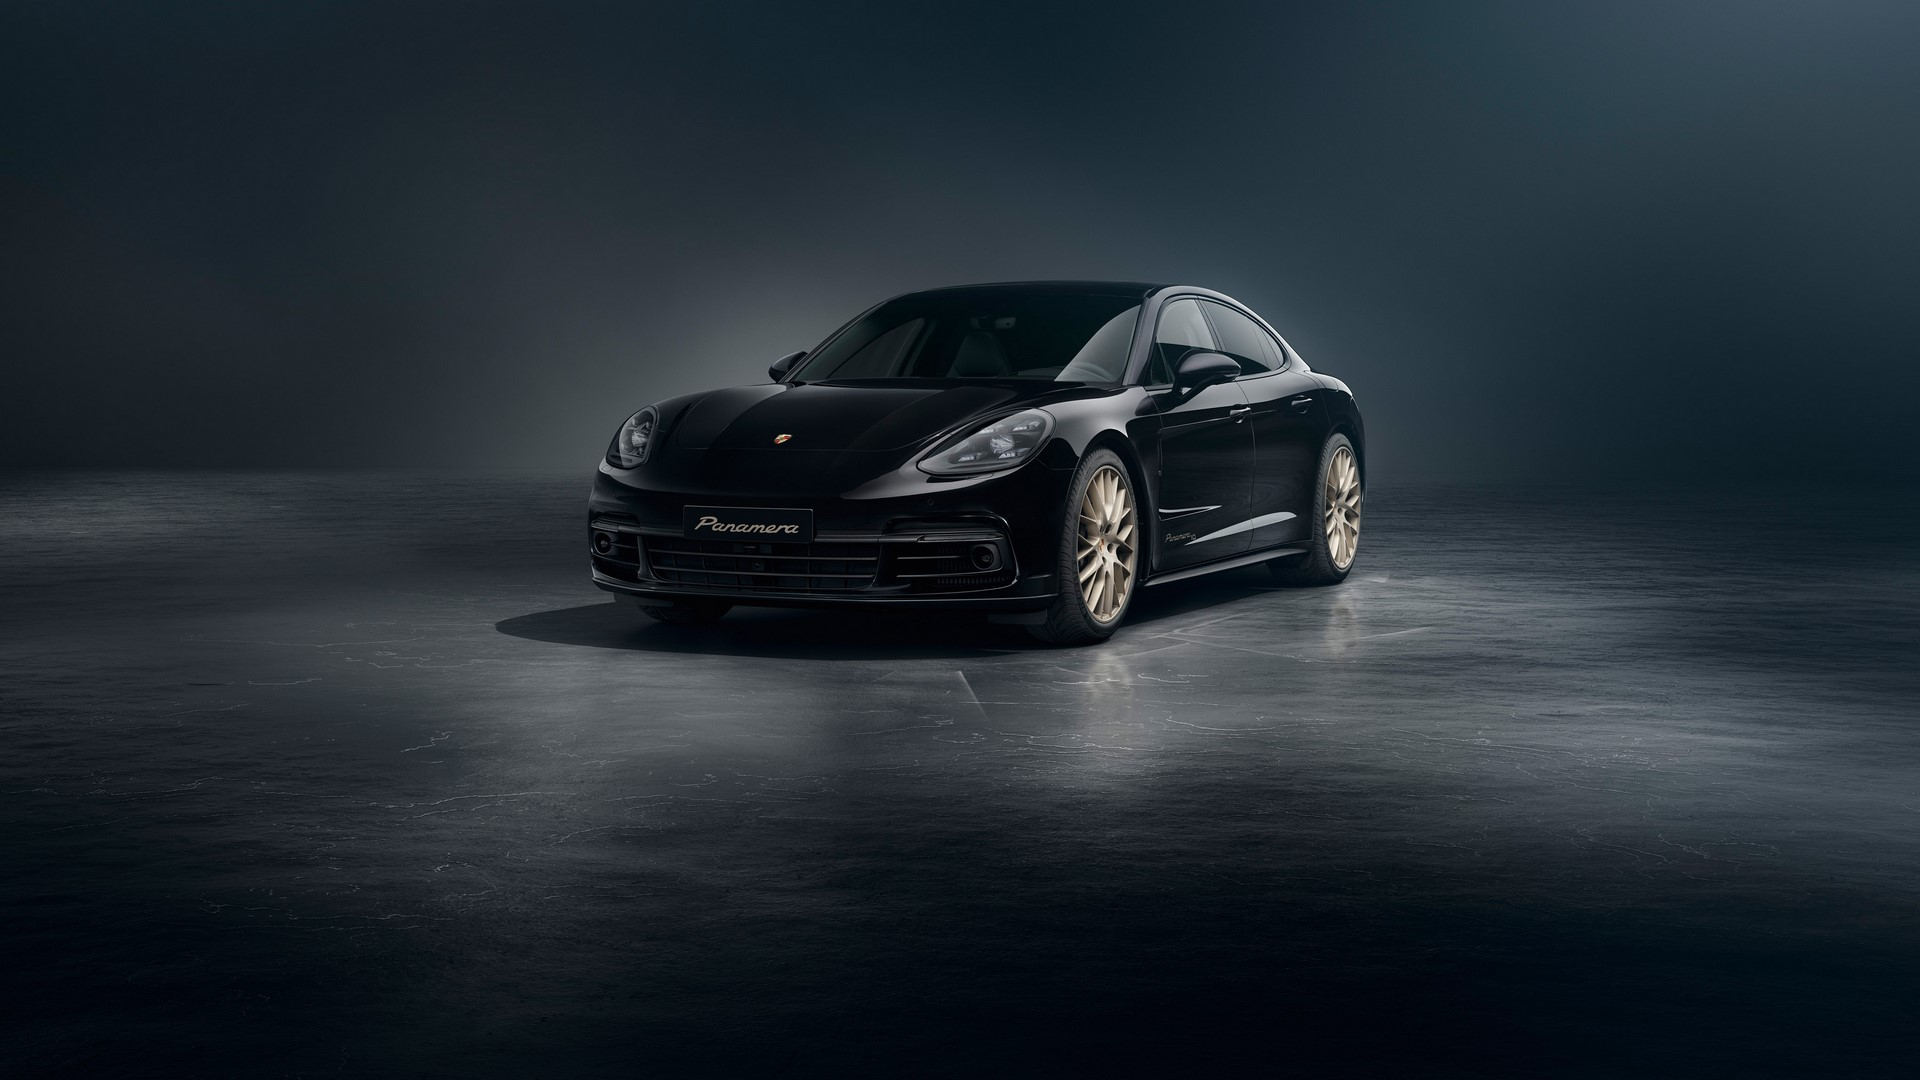 Porsche-Panamera-10-Years-Edition-3